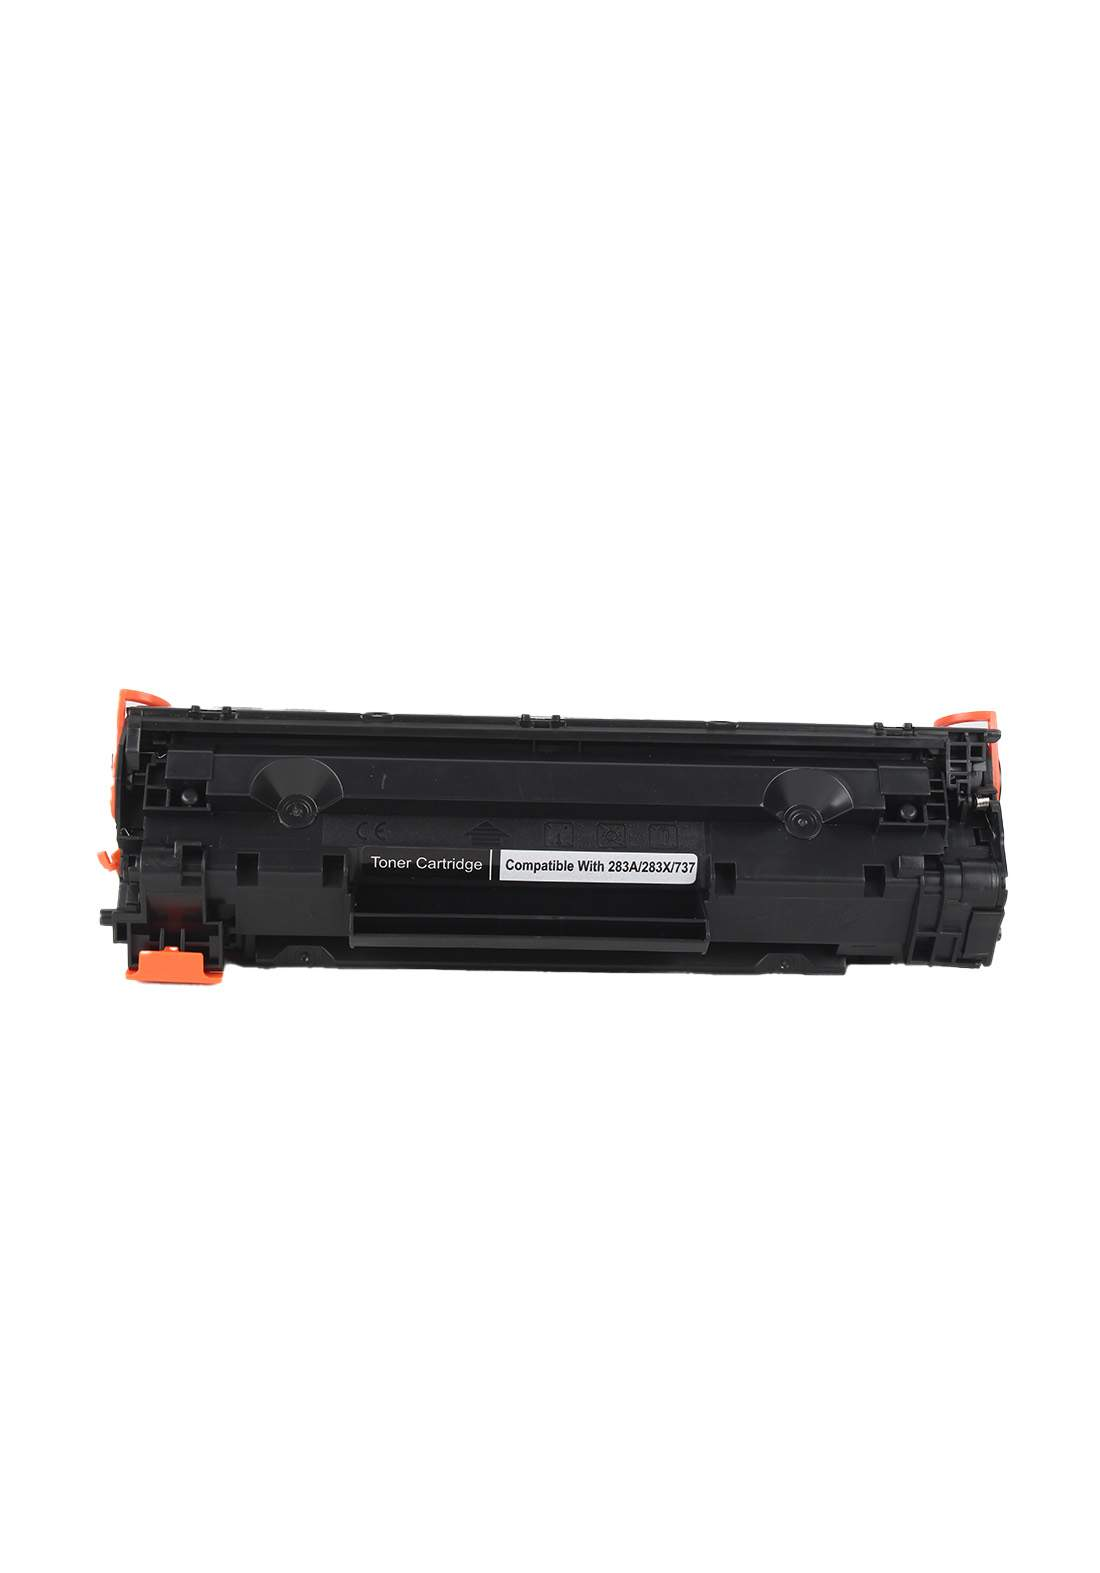 Power Tiger 283A/283X/737 Laser Printer Toner Cartridge خرطوشة حبر